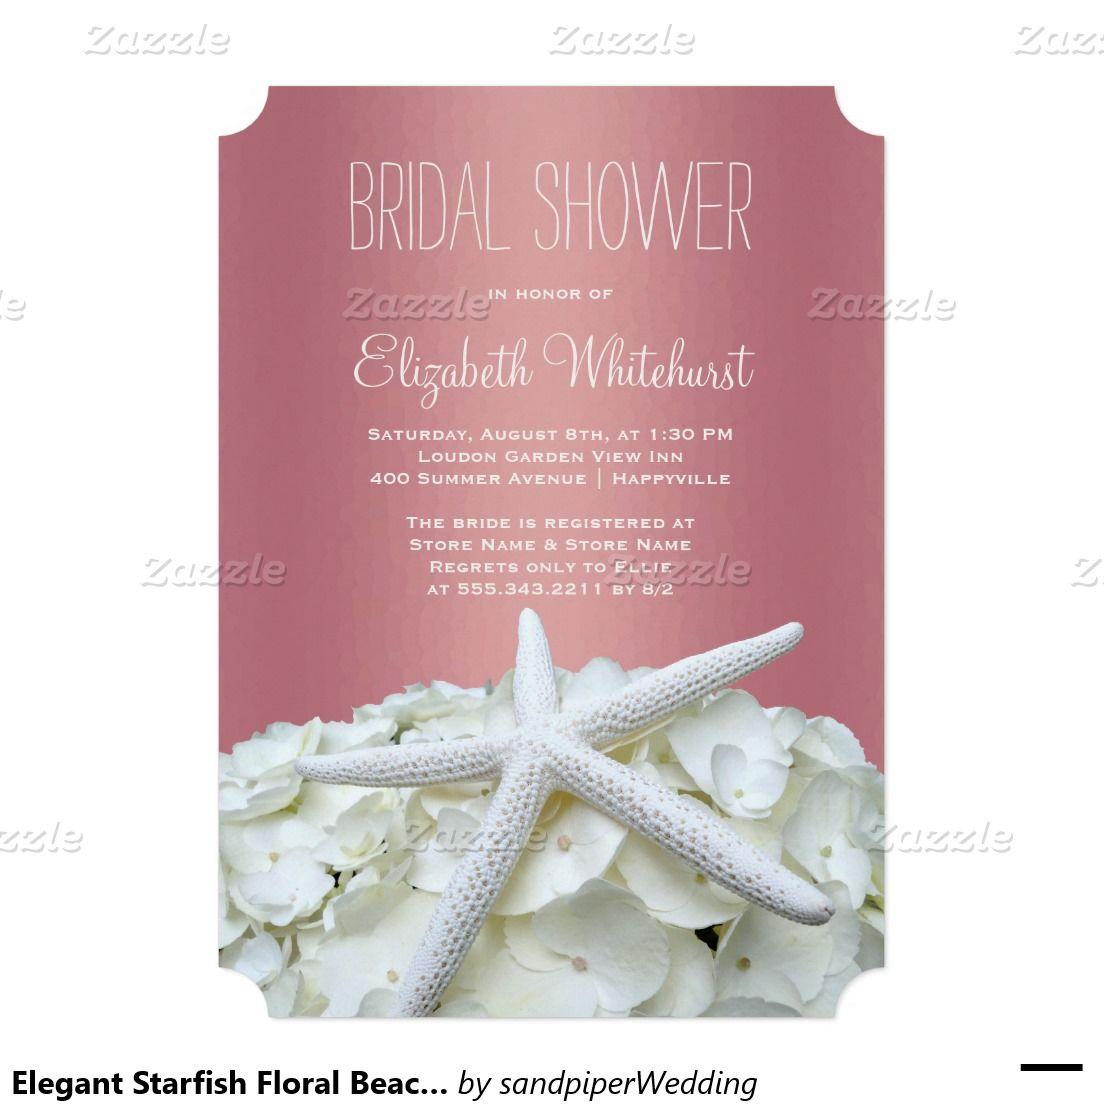 Elegant Starfish Floral Beach Bridal Shower Invitation | Designer ...